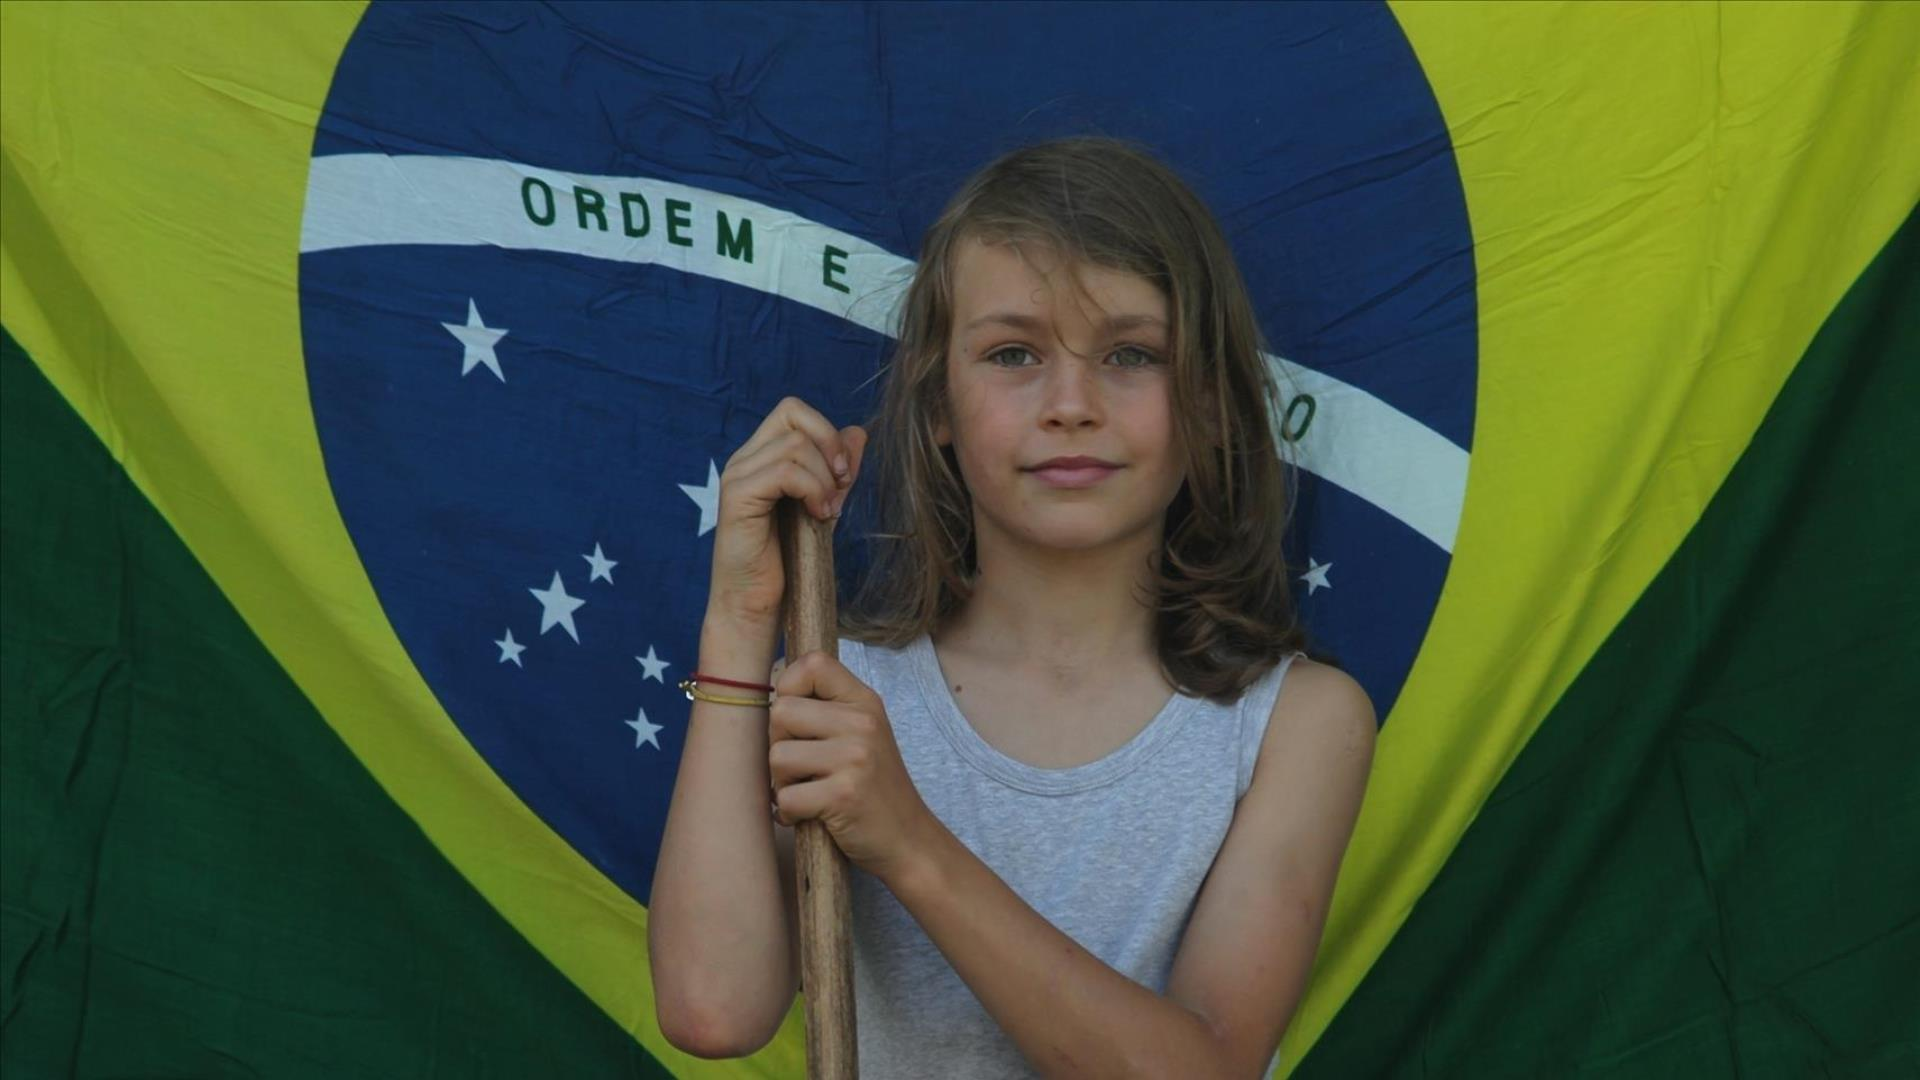 Brasilien | Imbassai, Dendeküste, Salvador: 15 Tage Familienurlaub - Brasilien for family in Bahia